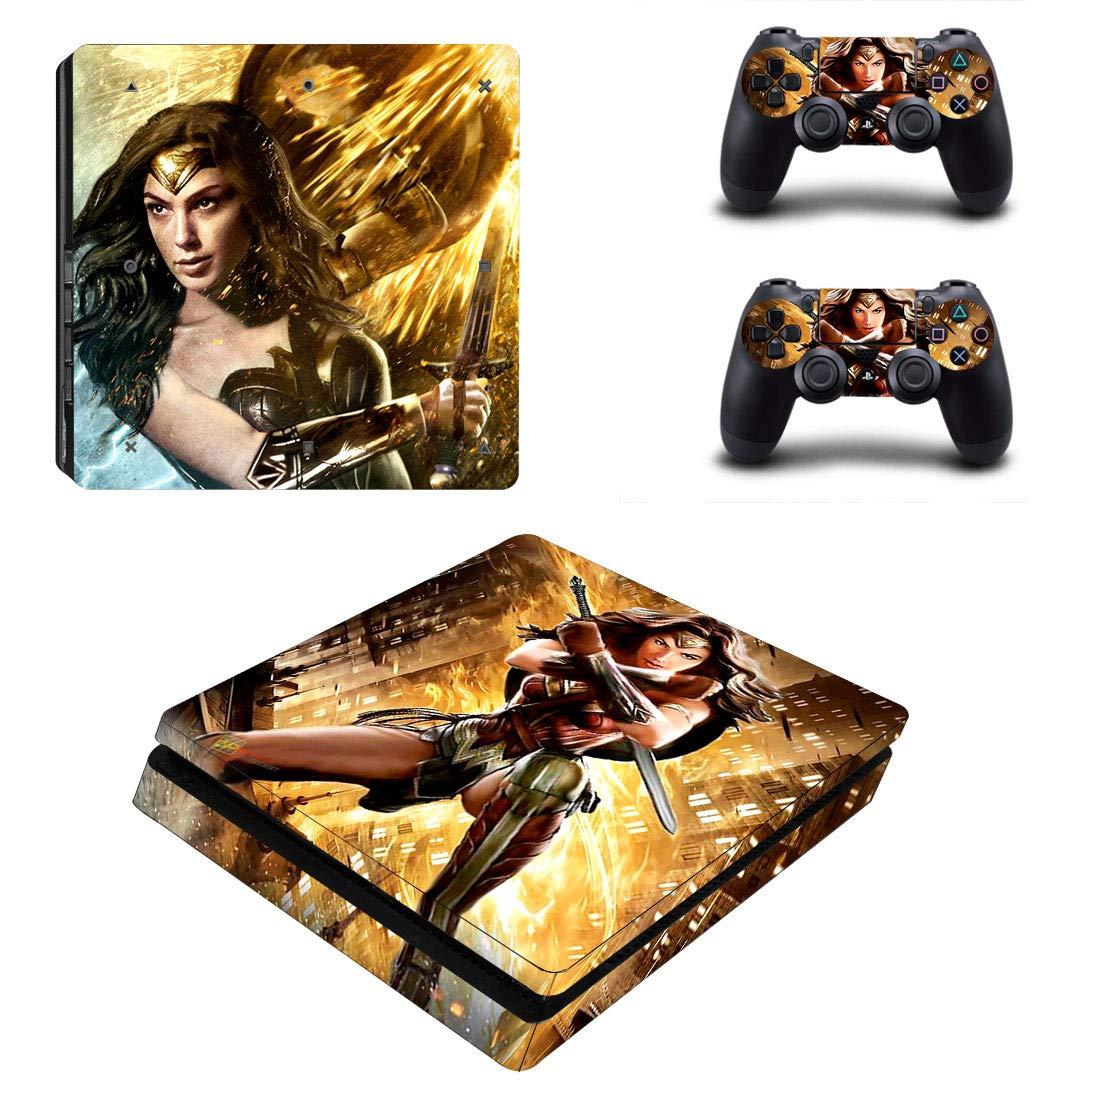 Adventure Games - PS4 SLIM - Wonder Woman - Playstation 4 Vinyl Console Skin Decal Sticker + 2 Controller Skins Set